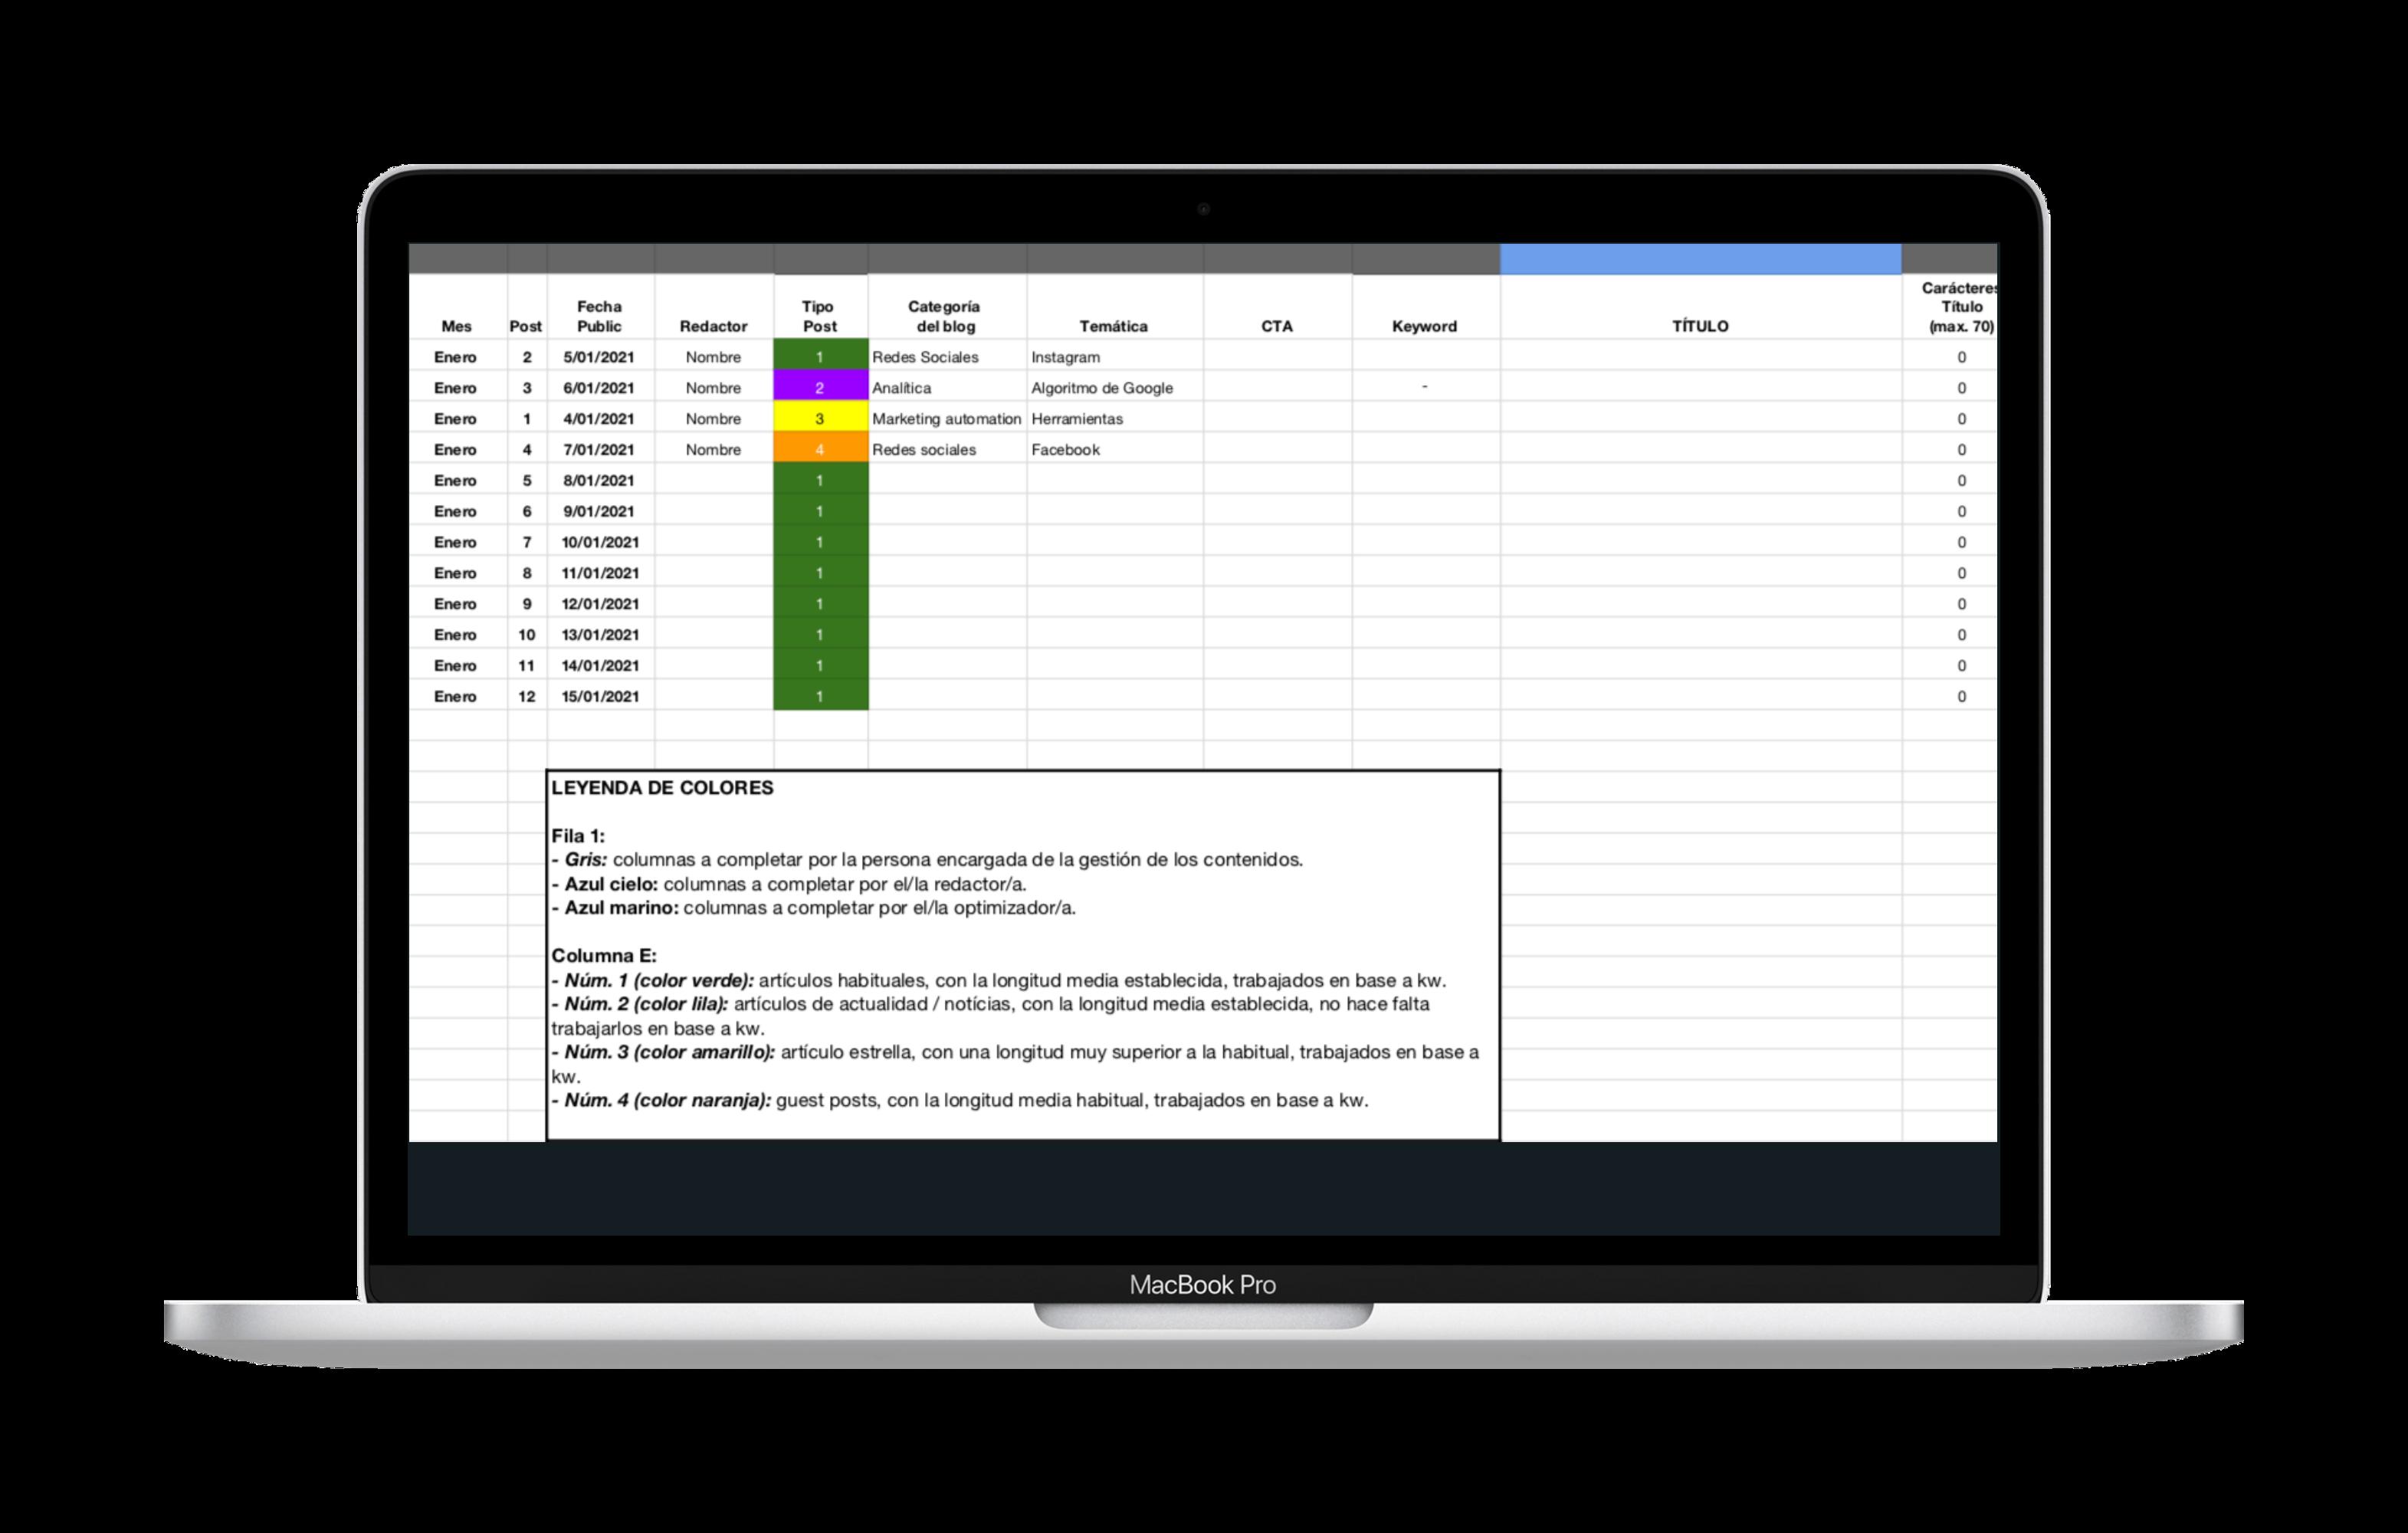 Captura de pantalla 2020-10-20 a las 11.57.30-Macbook Pro 2016